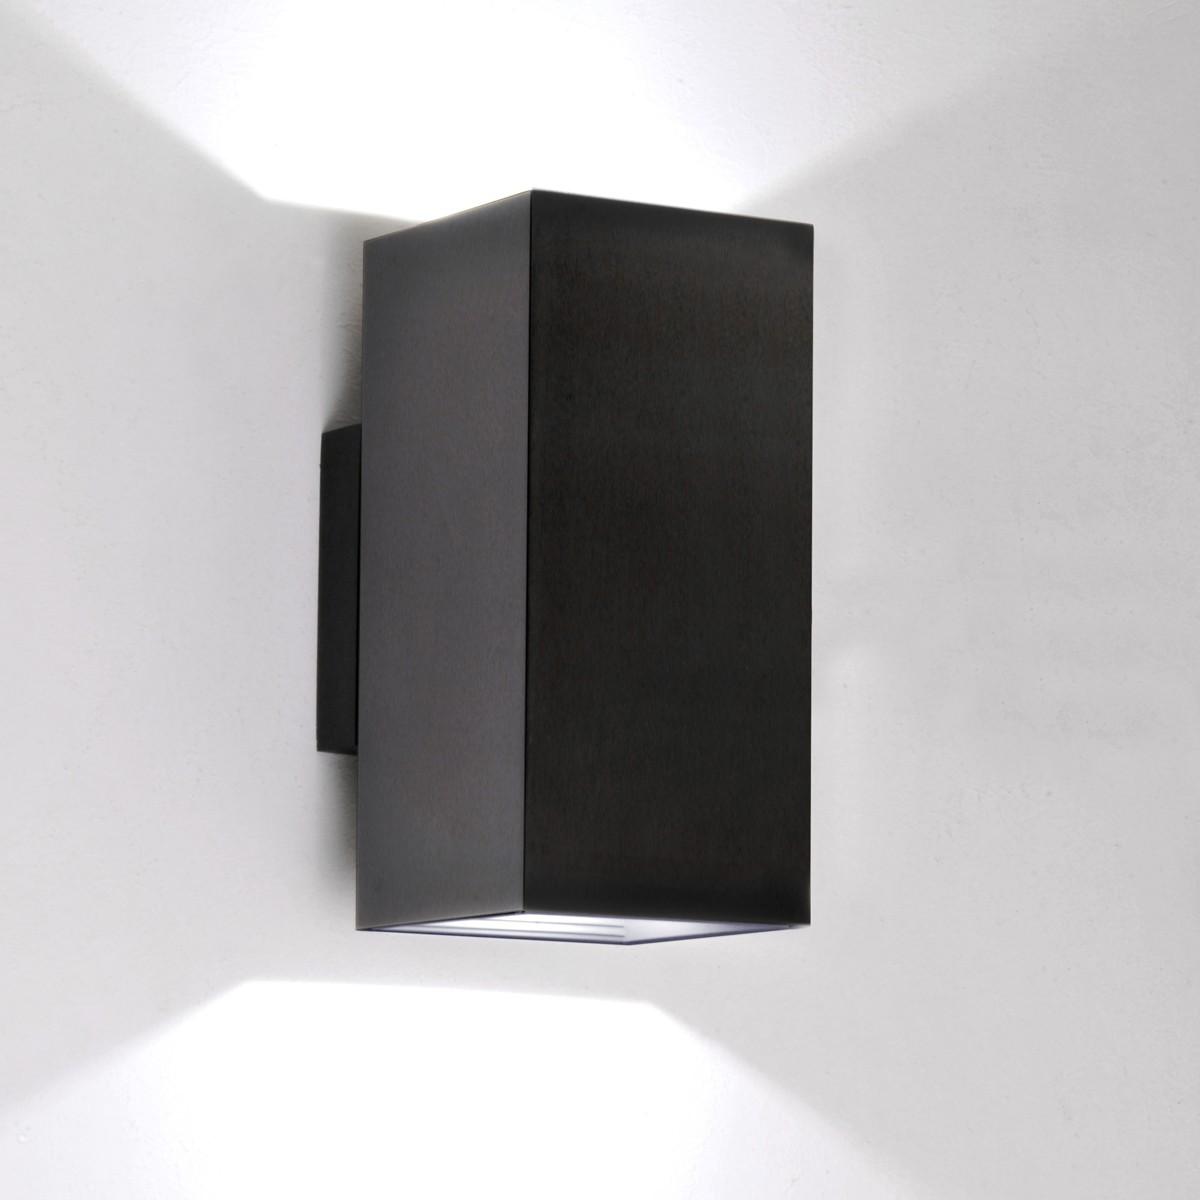 Milan Dau Doble LED Wandleuchte, schwarz gebürstet